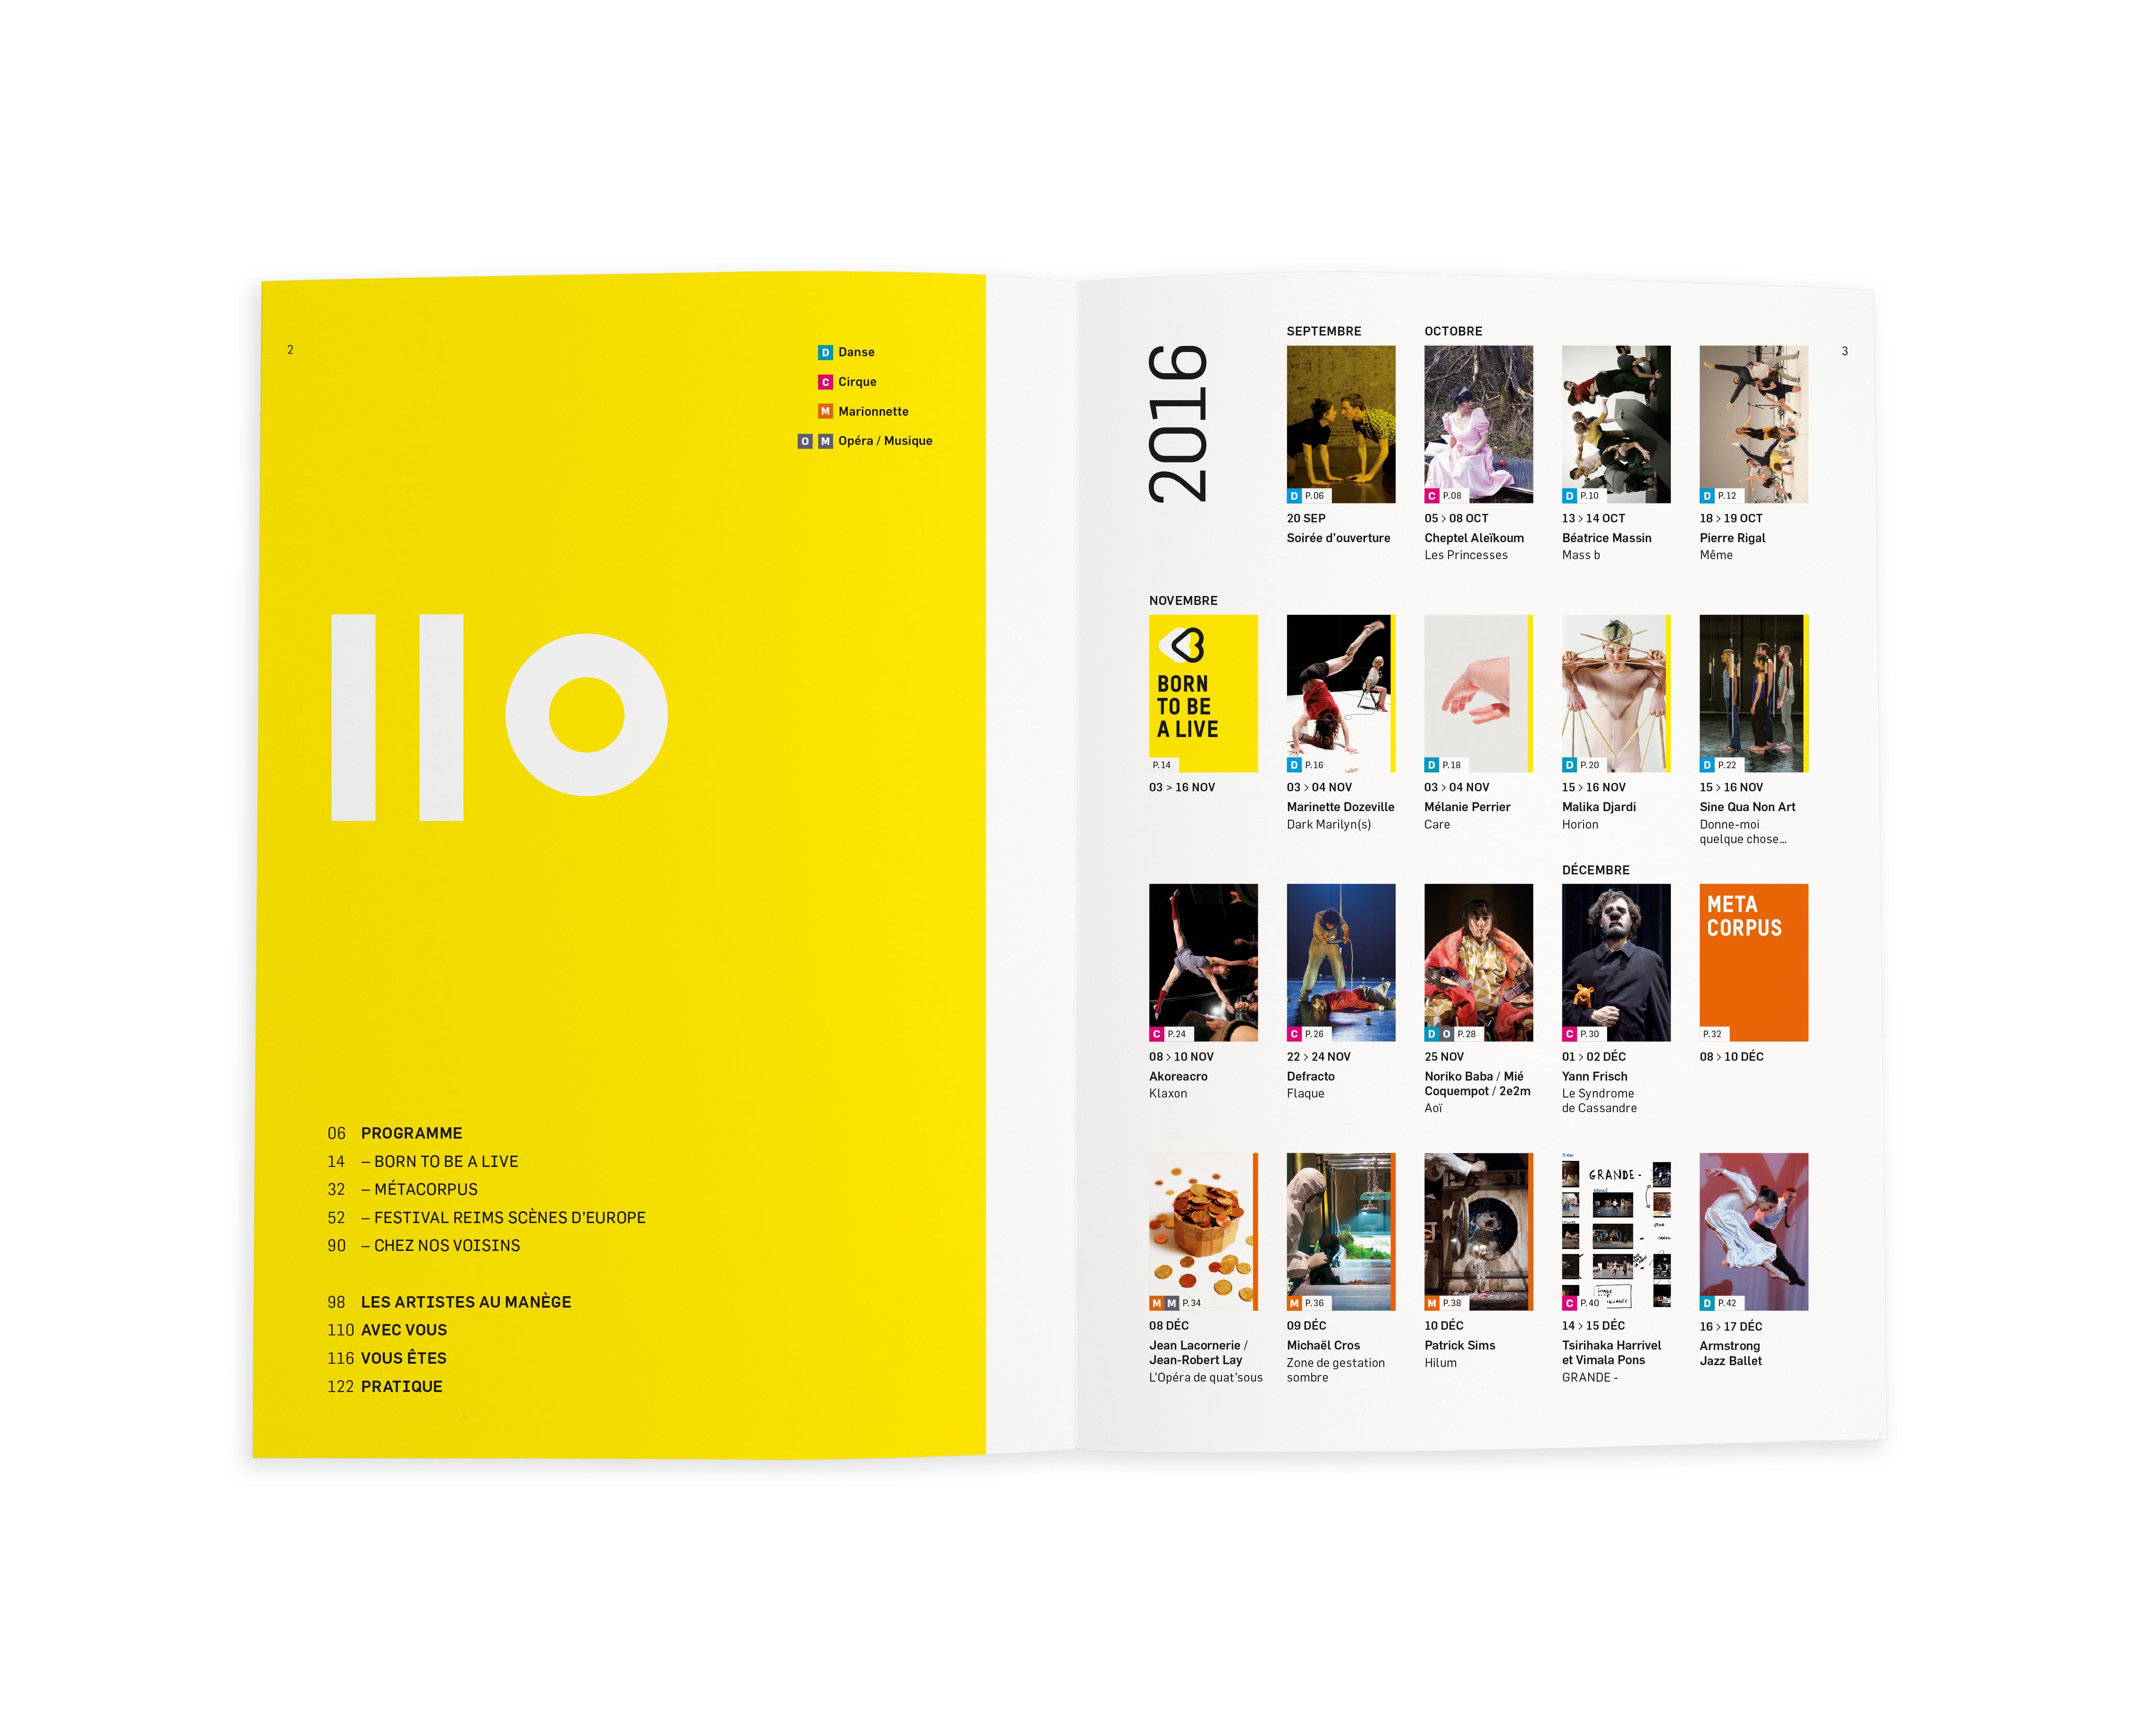 16 17 SAISON Brochure 04